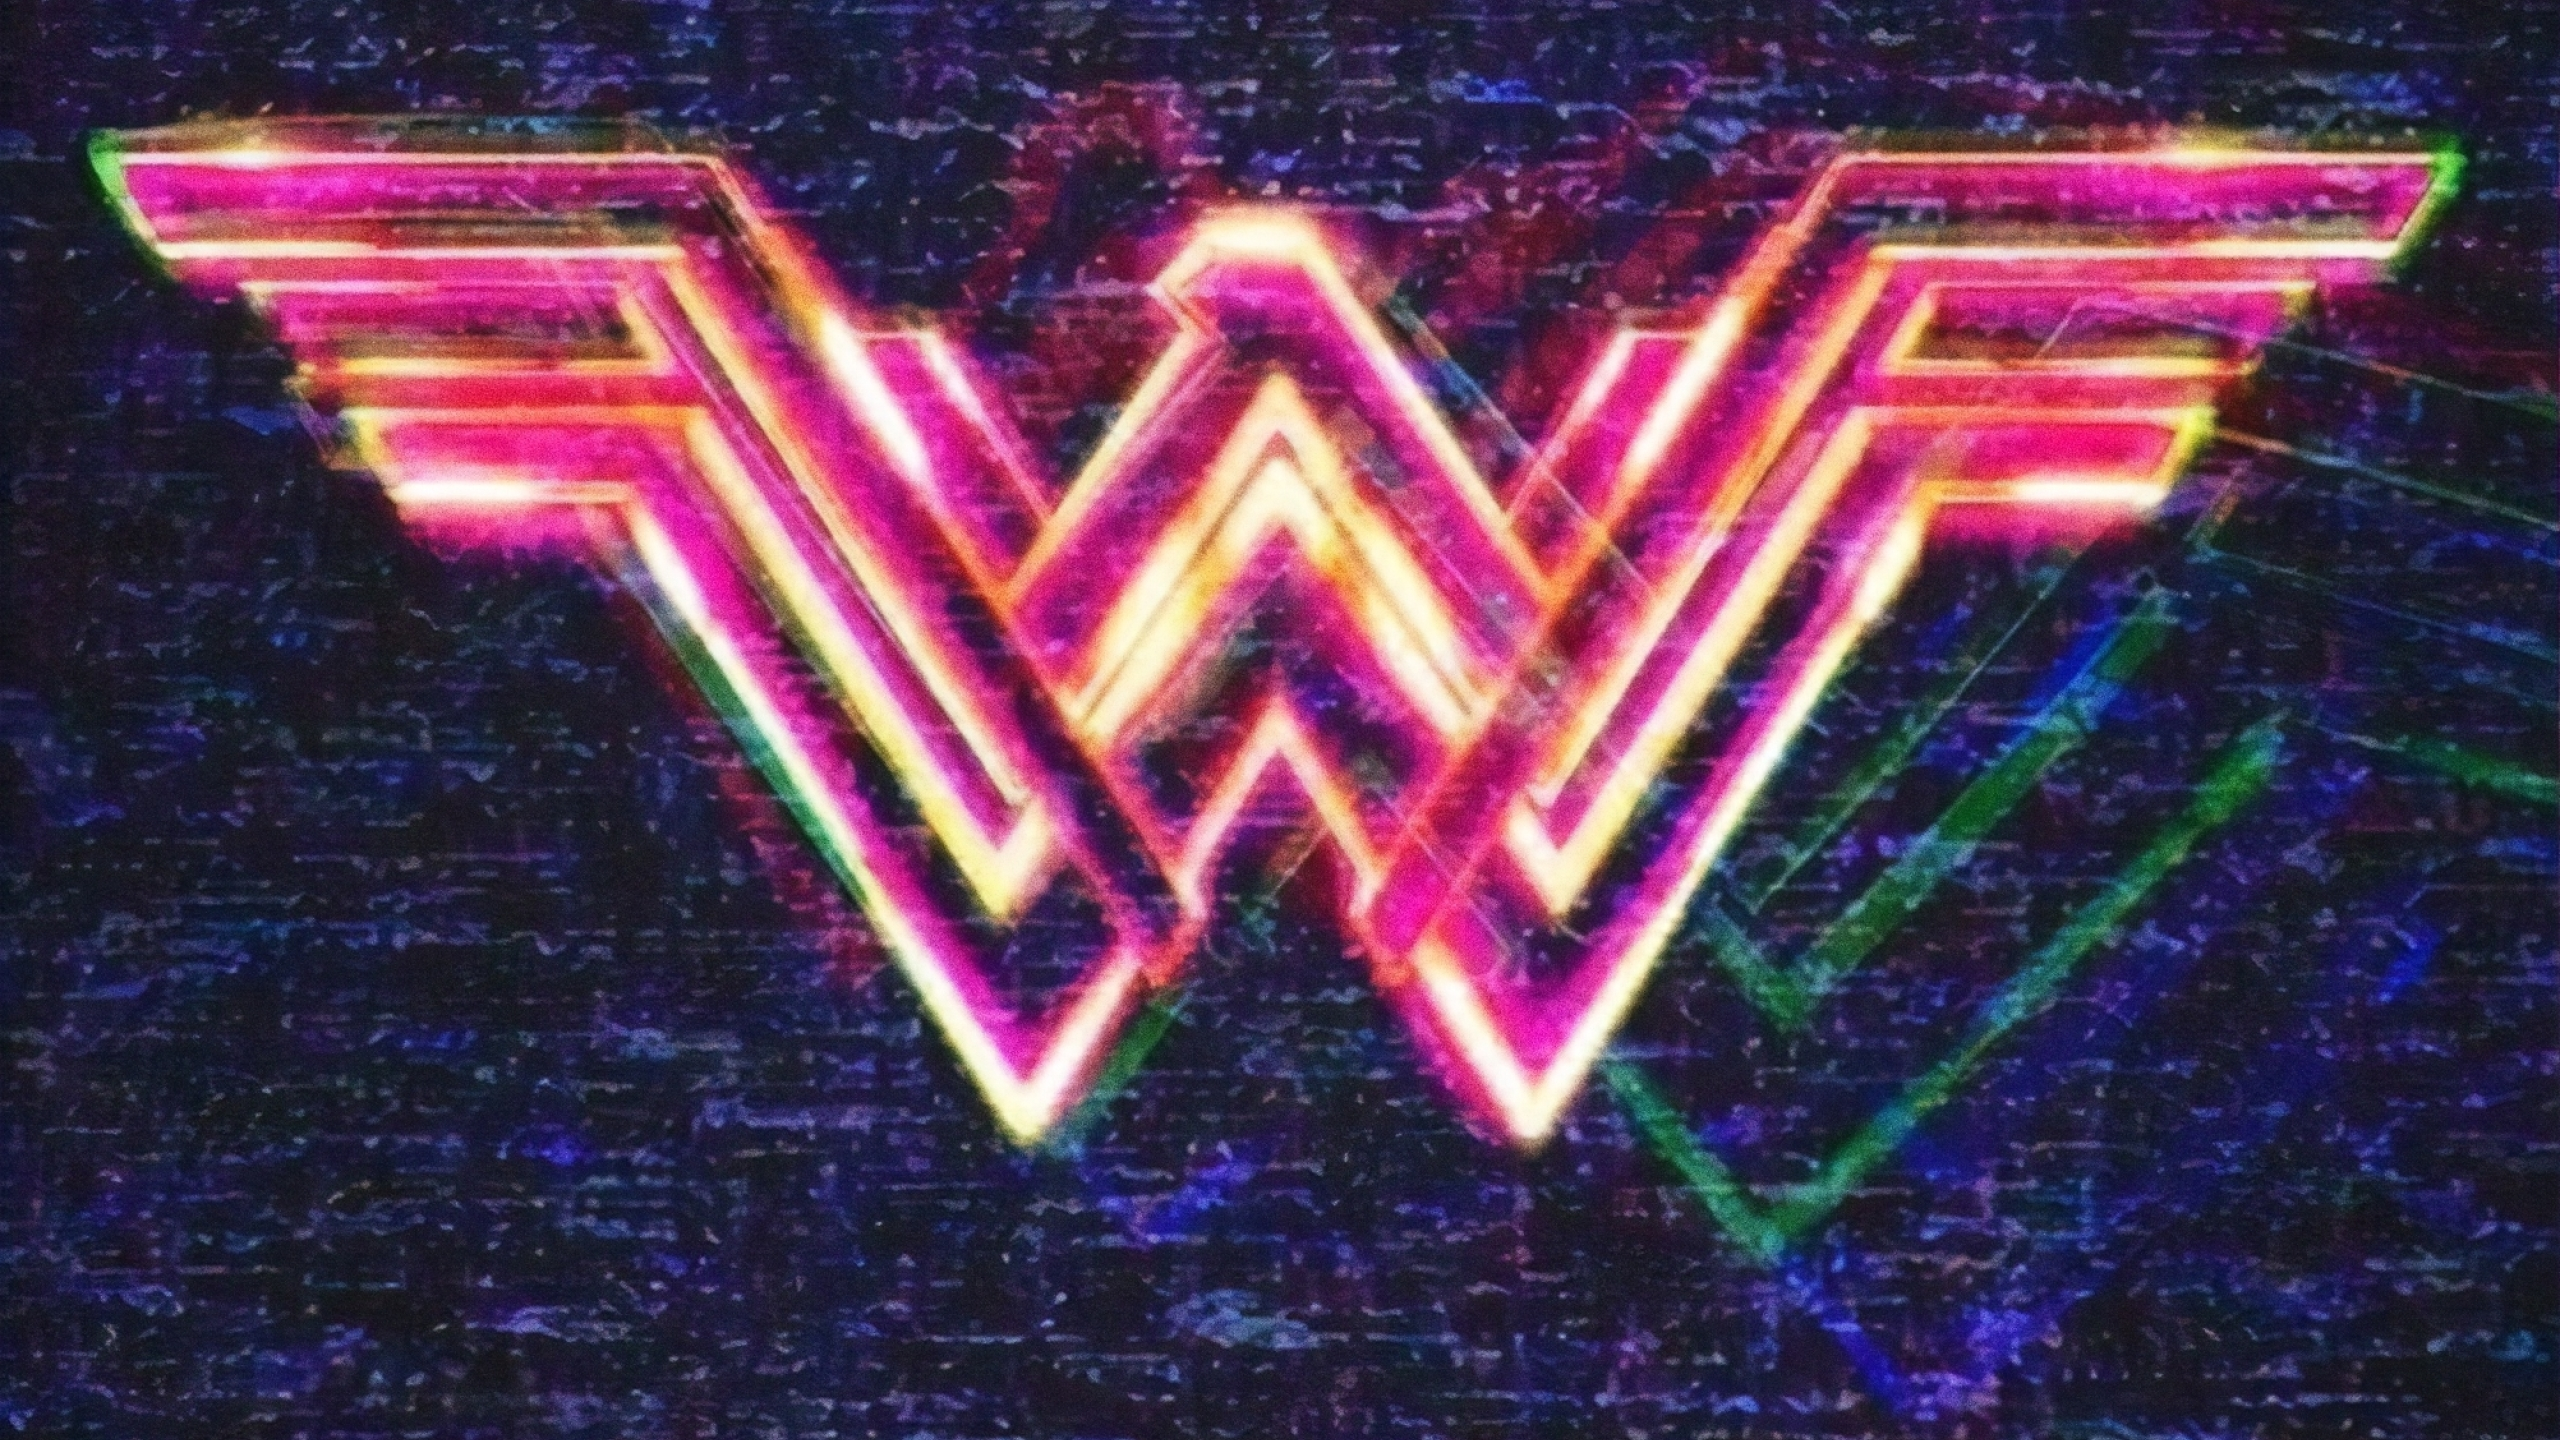 2560x1440 Wonder Woman 1984 Poster 1440P Resolution Wallpaper HD 2560x1440